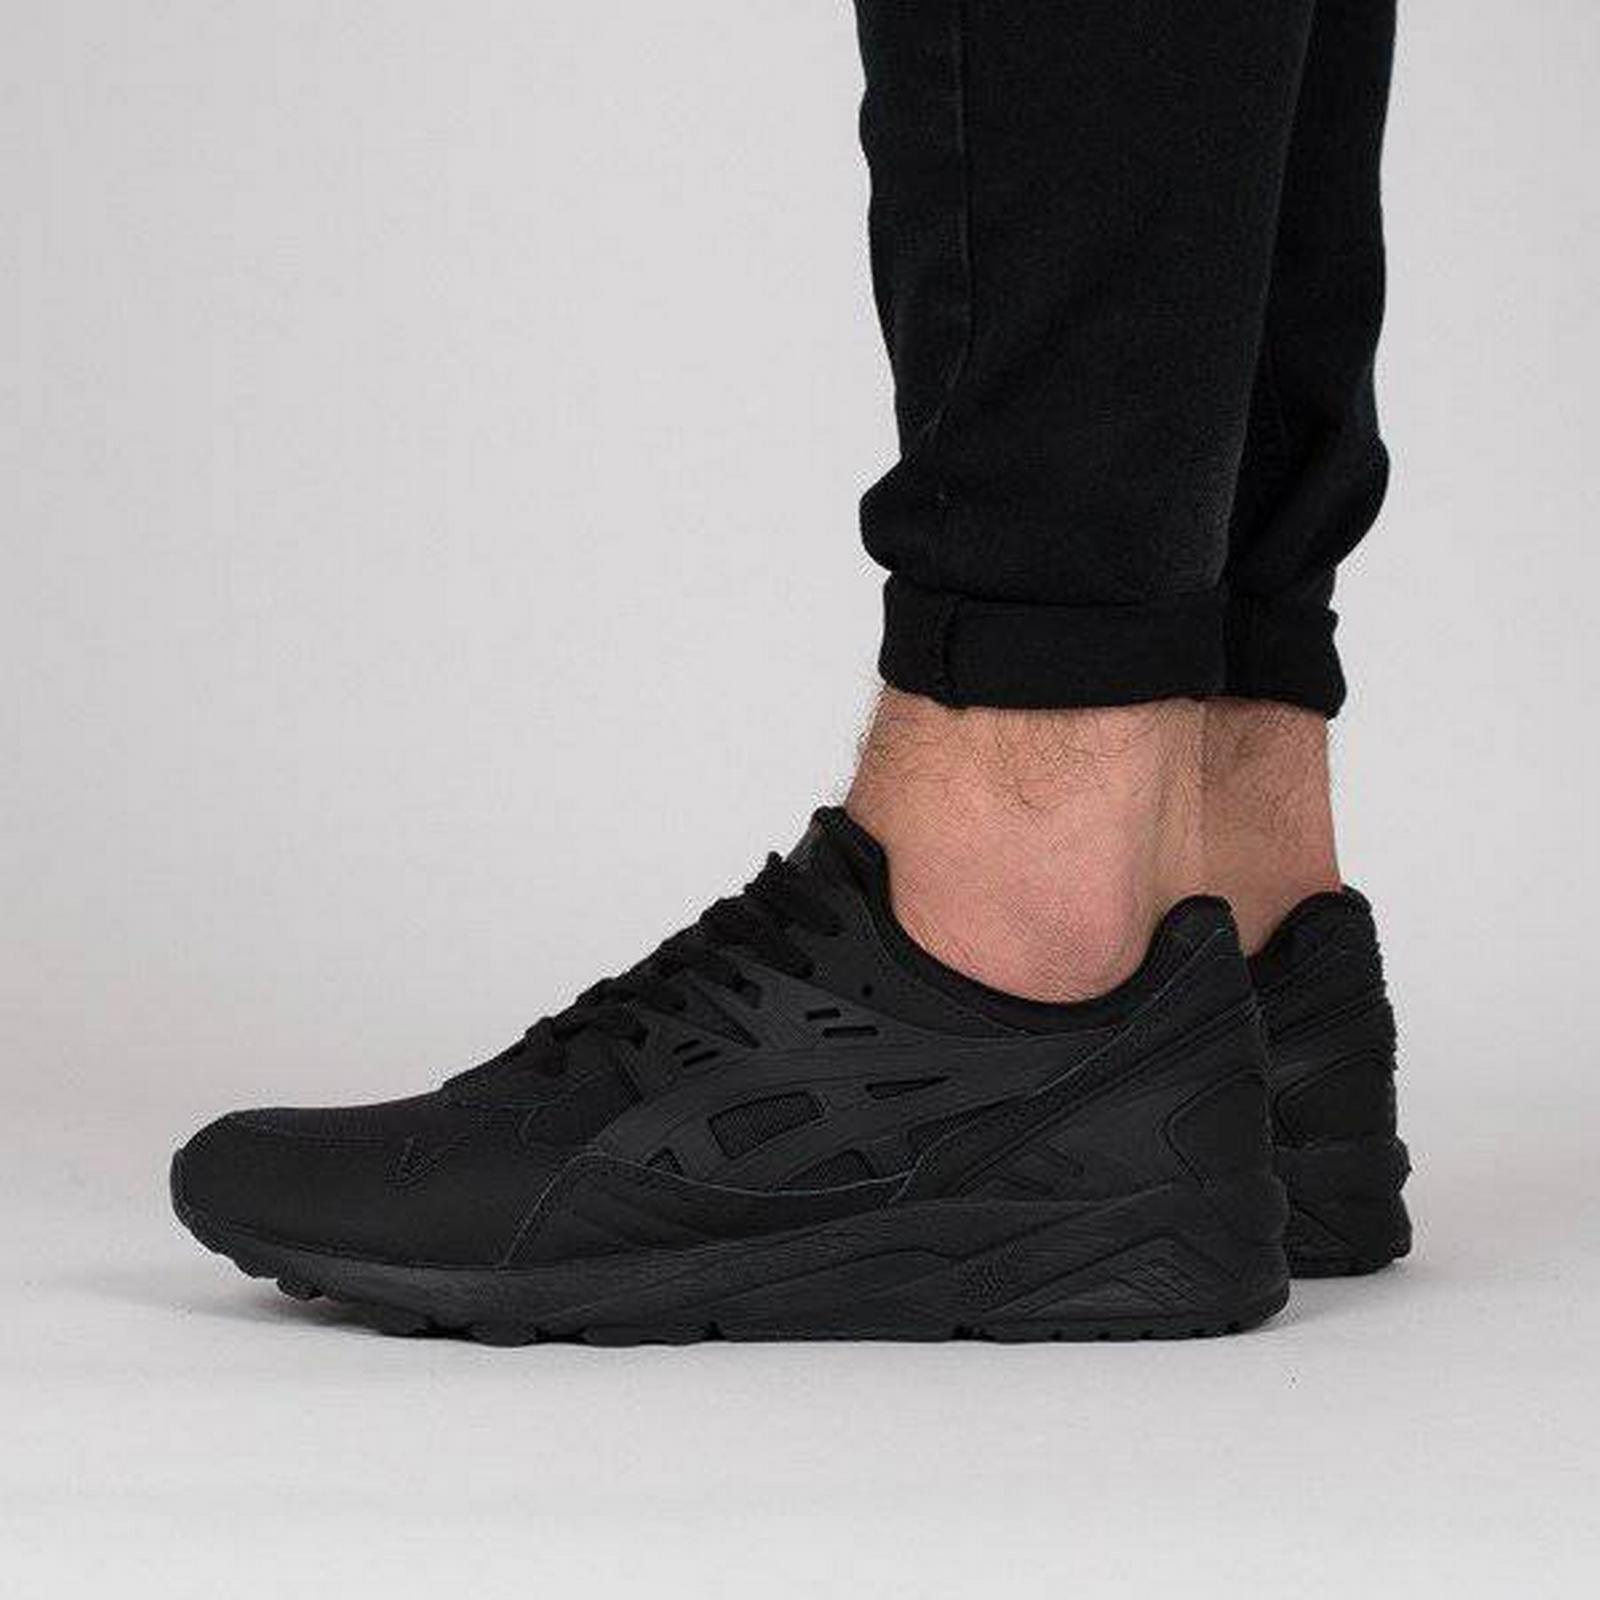 Asics Tiger Gel-Kayano Men's Shoes sneakers Asics Gel-Kayano Tiger Trainer HN7J3 9090 BLACK Size 40,5 e10f4c